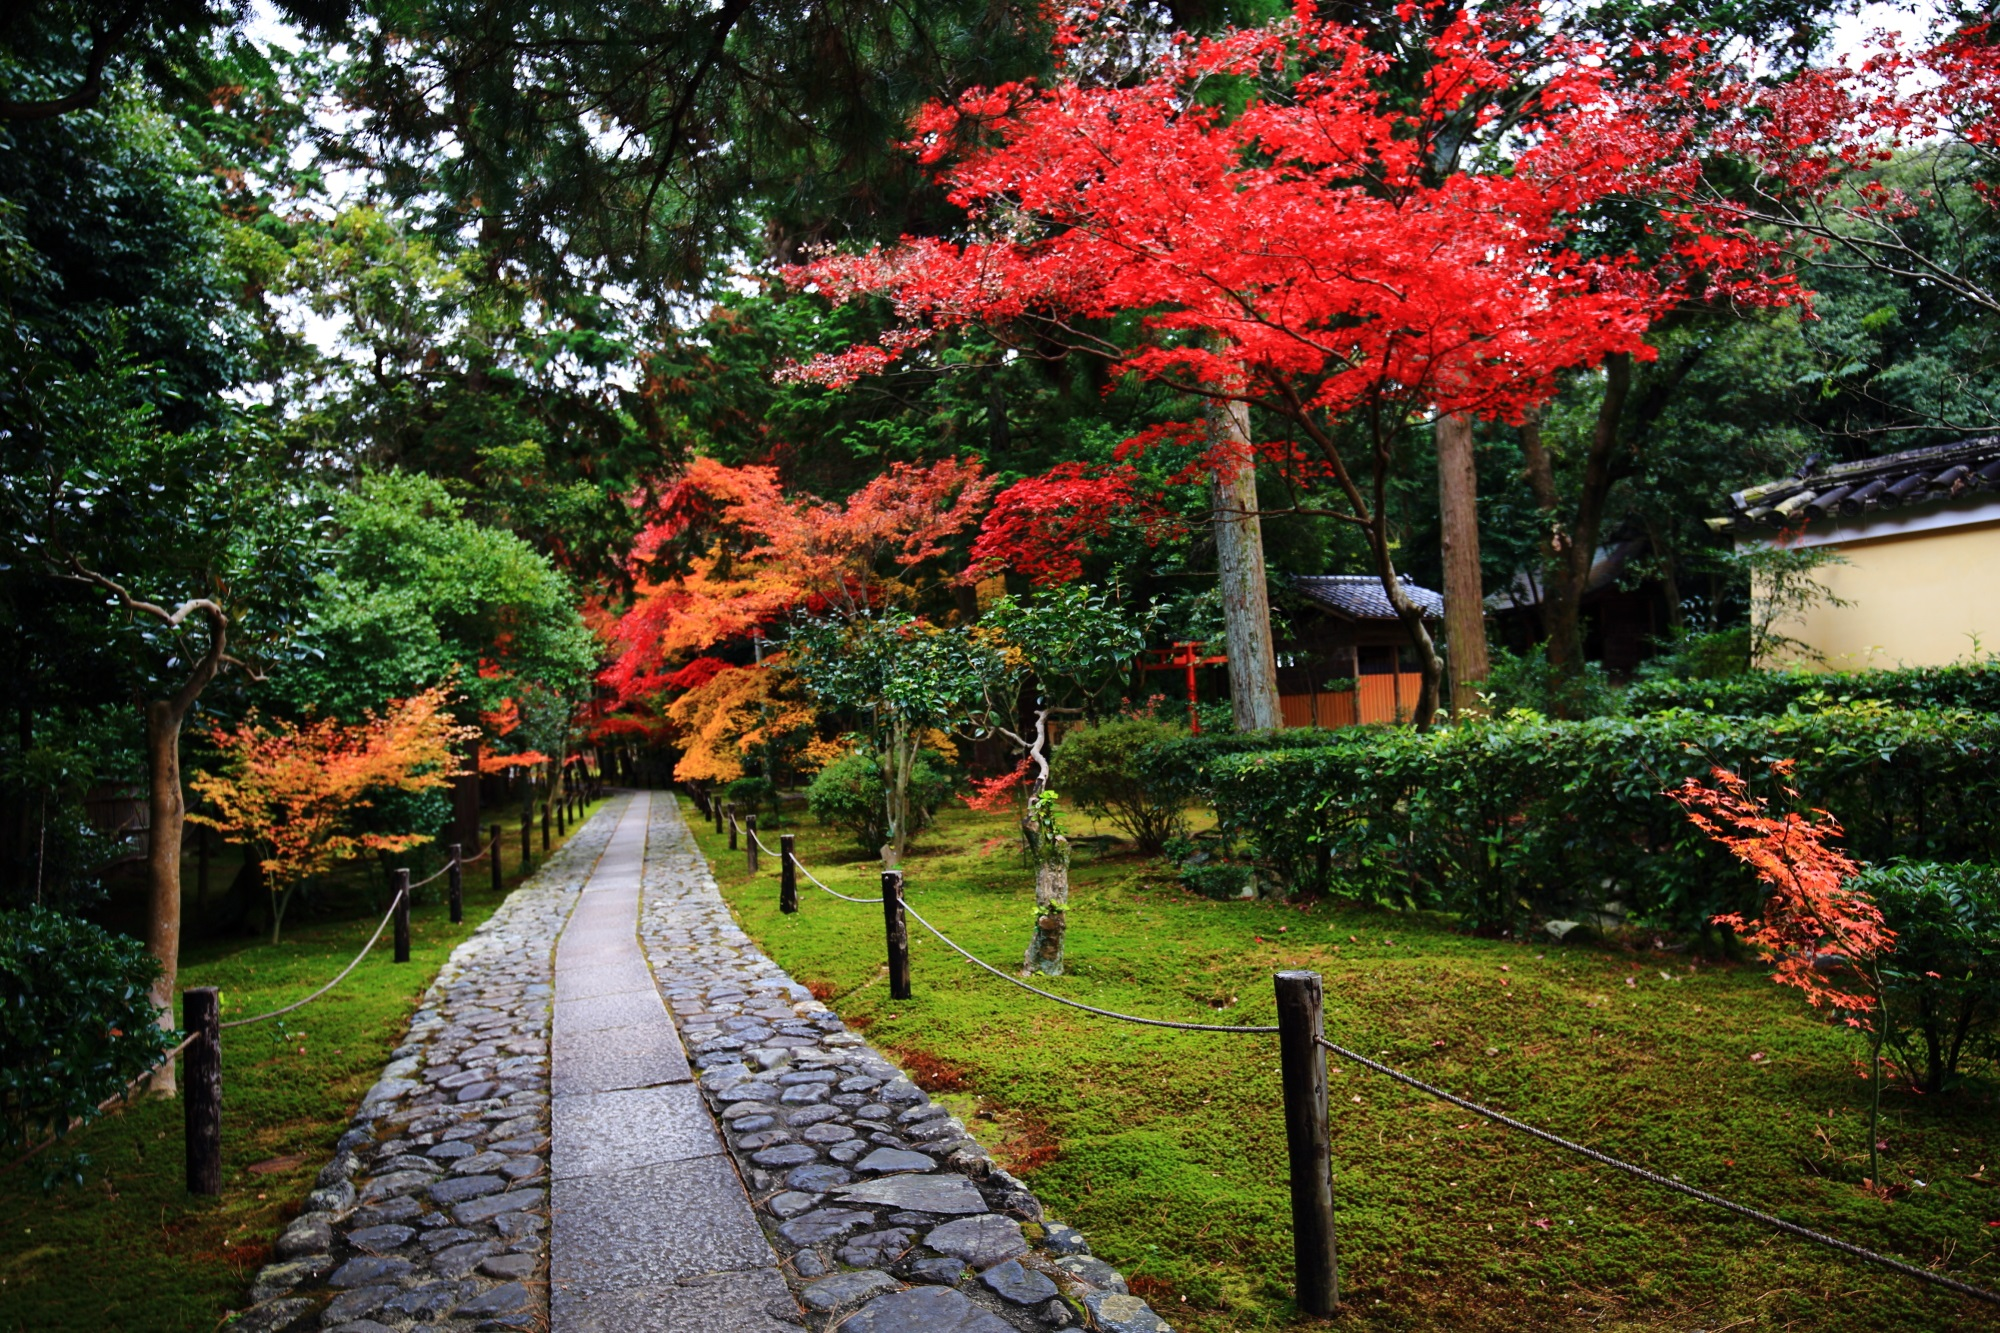 Kyoto Rokuoin-Temple autumn leaves 鮮やか もみじ 参道 秋 見ごろ